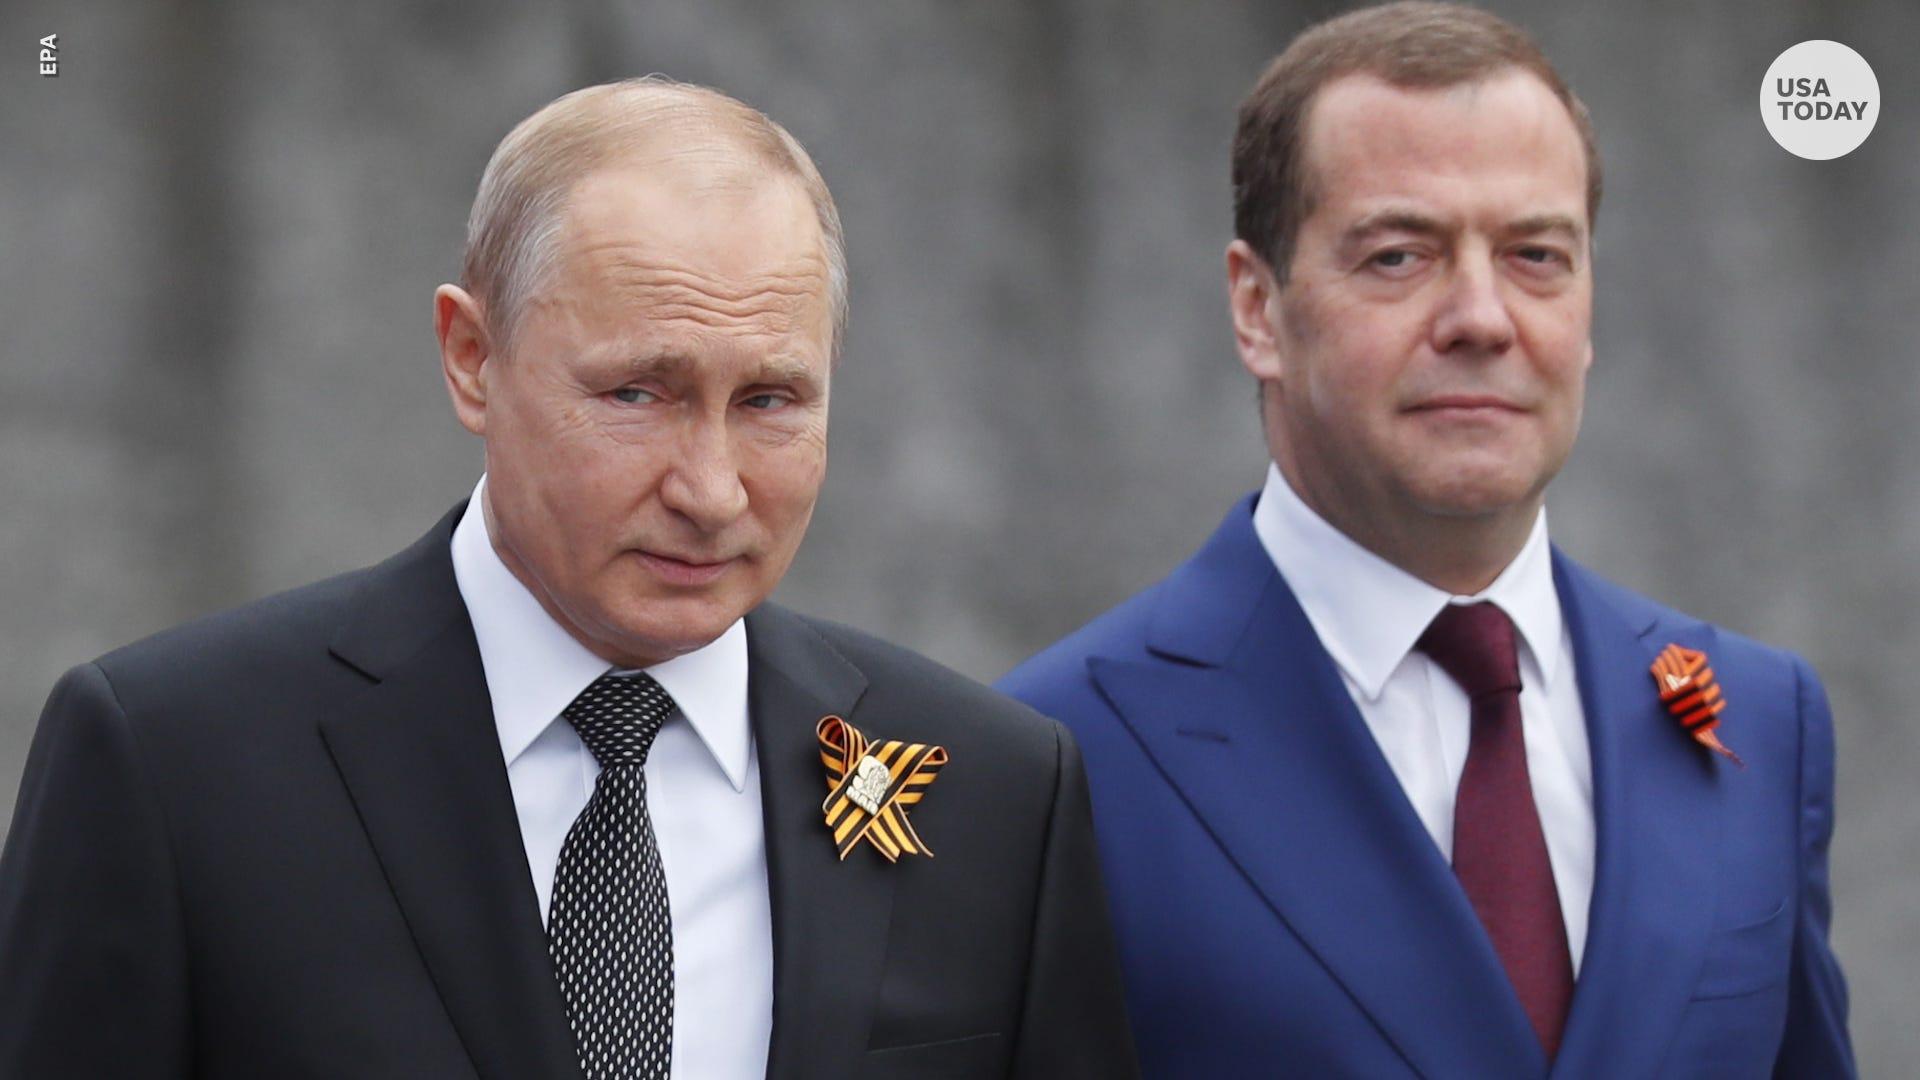 Vladimir Putin Duma Oks Law To Allow Him To Stay In Power Until 2036